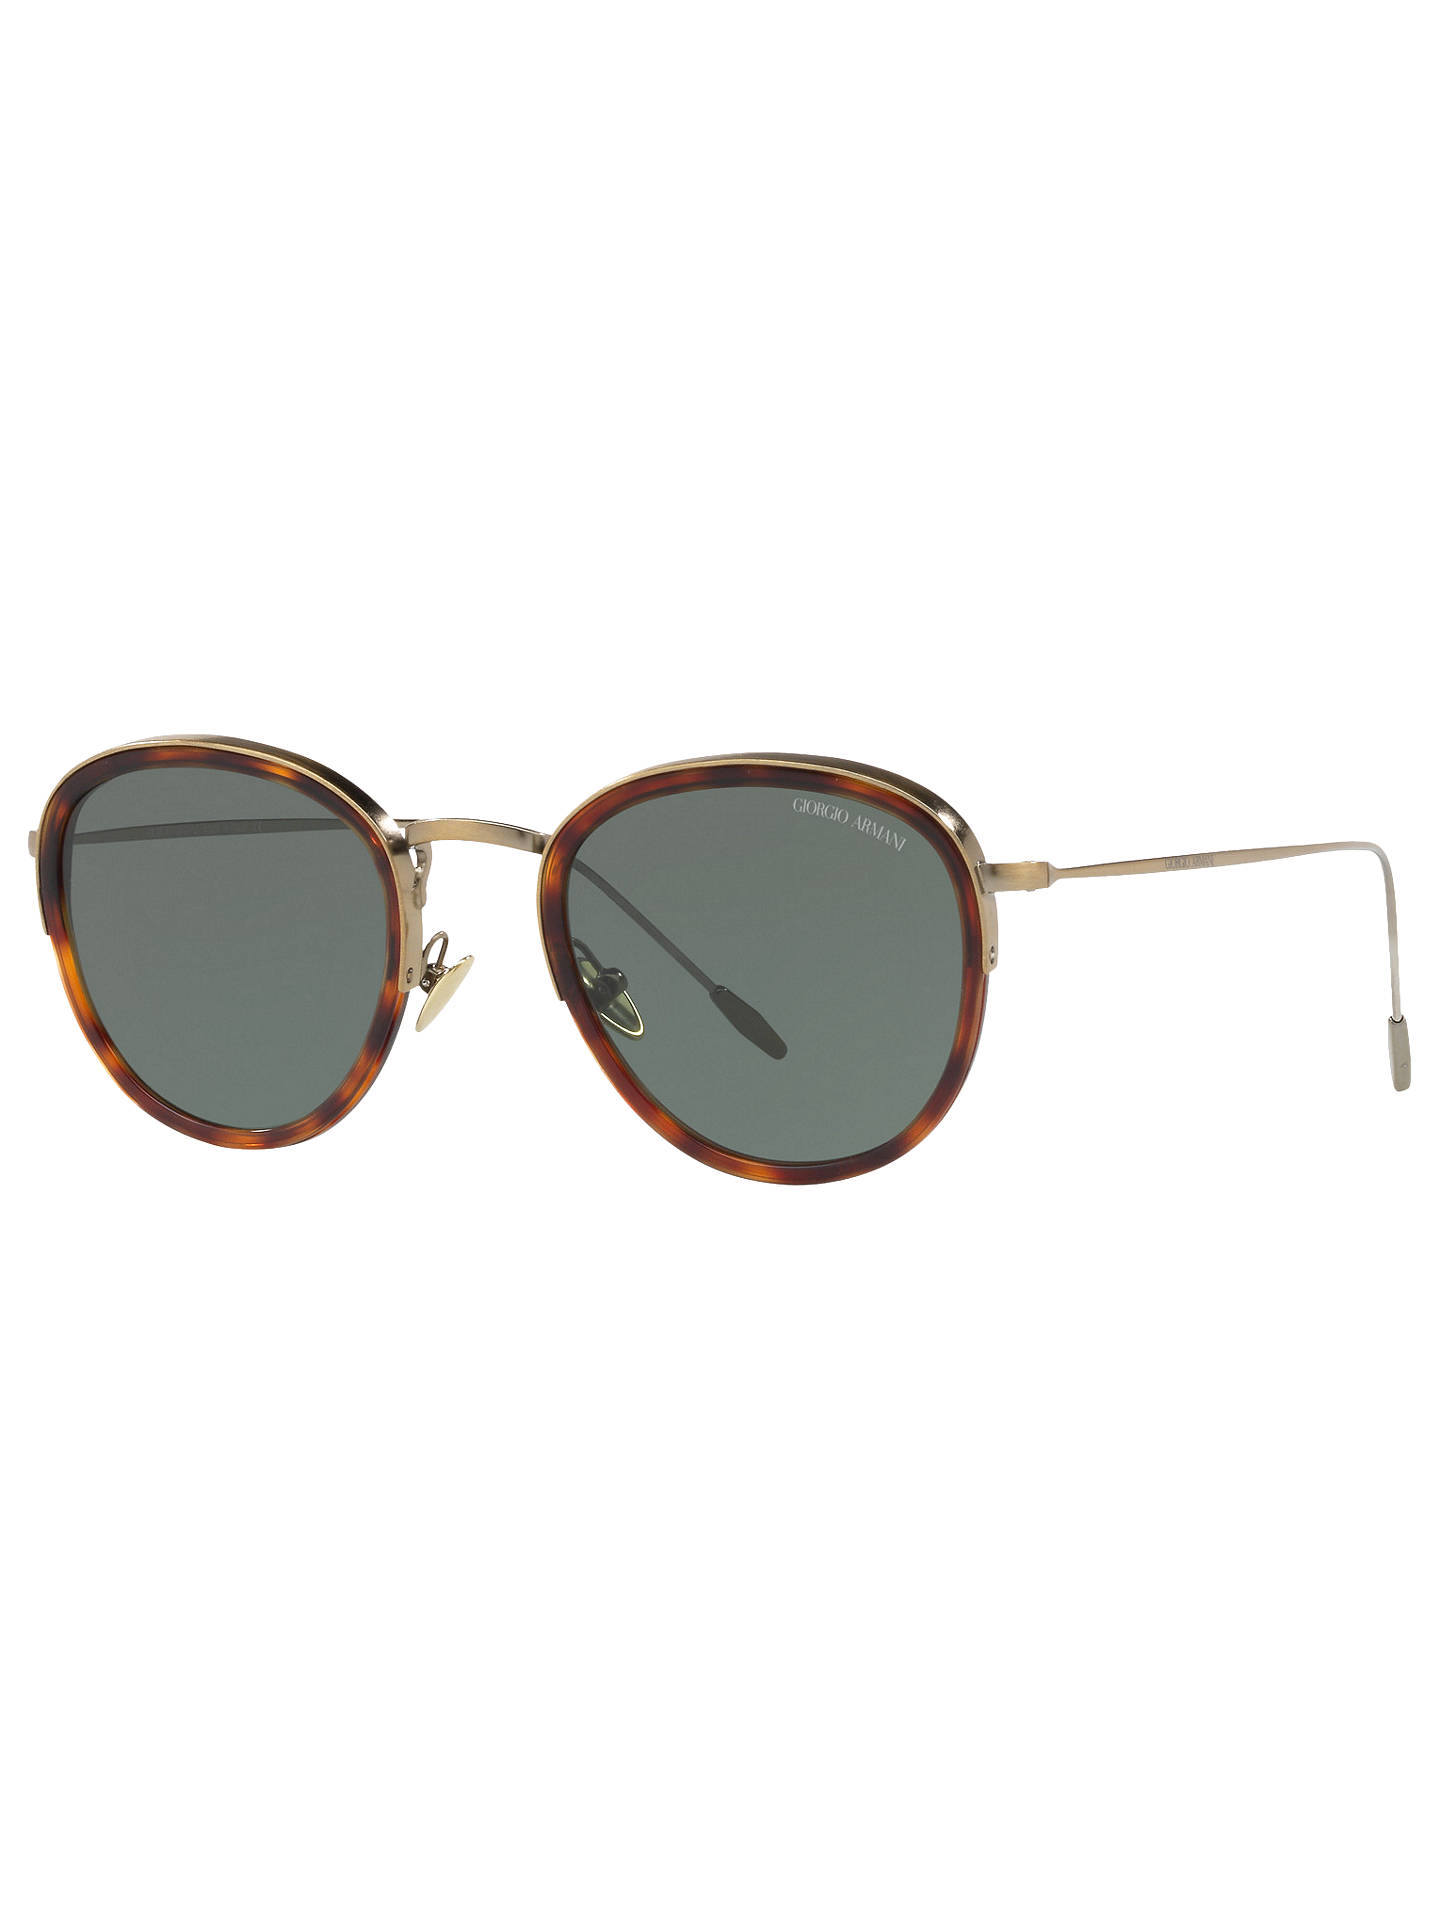 68b9255ad9f9 Giorgio Armani AR6068 Men s Frames of Life Round Sunglasses at John ...